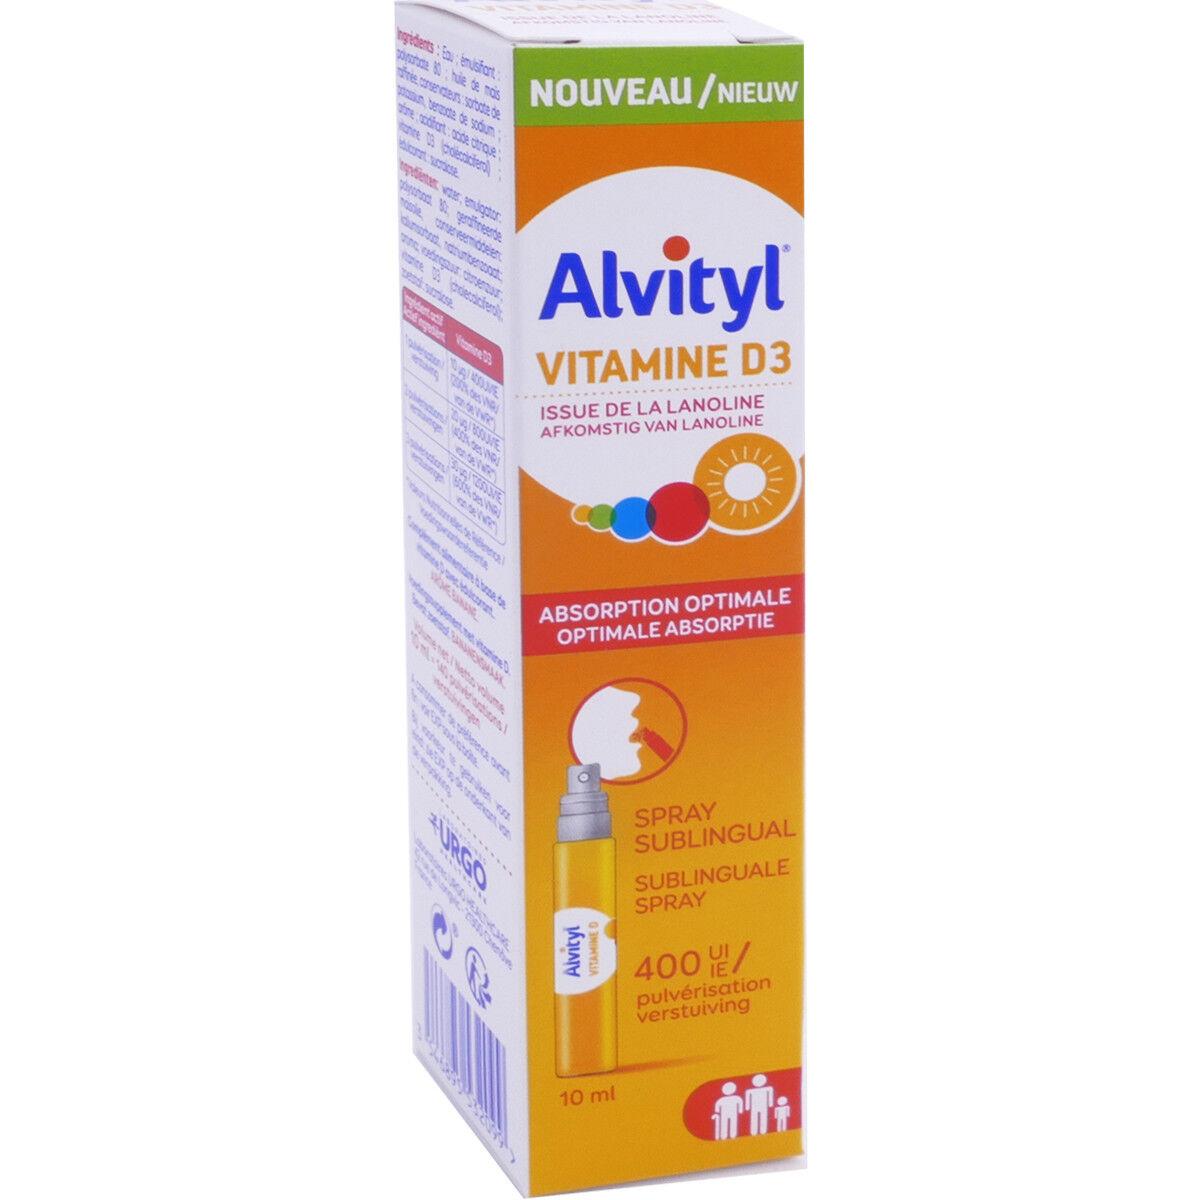 Alvityl vitamine d3 10 ml spray sublingual